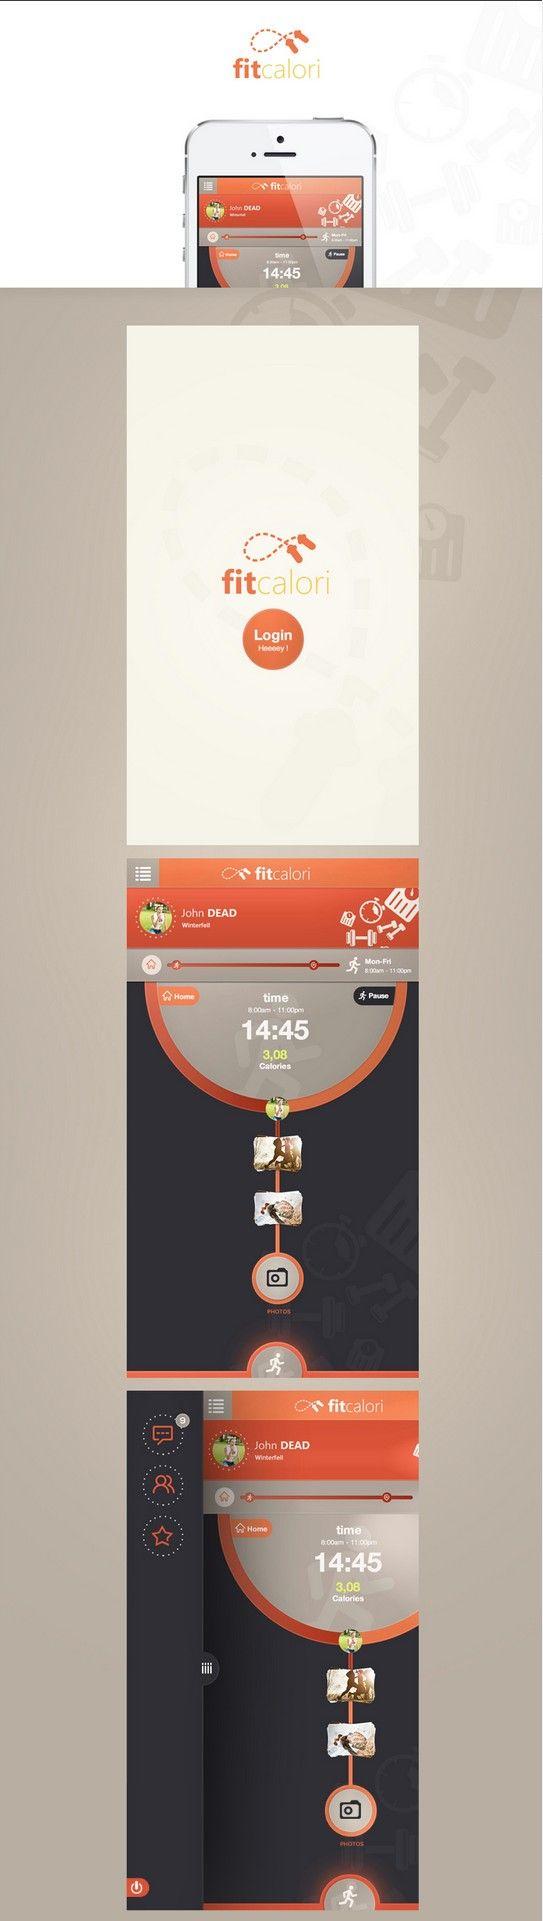 #gomo #mobile #design